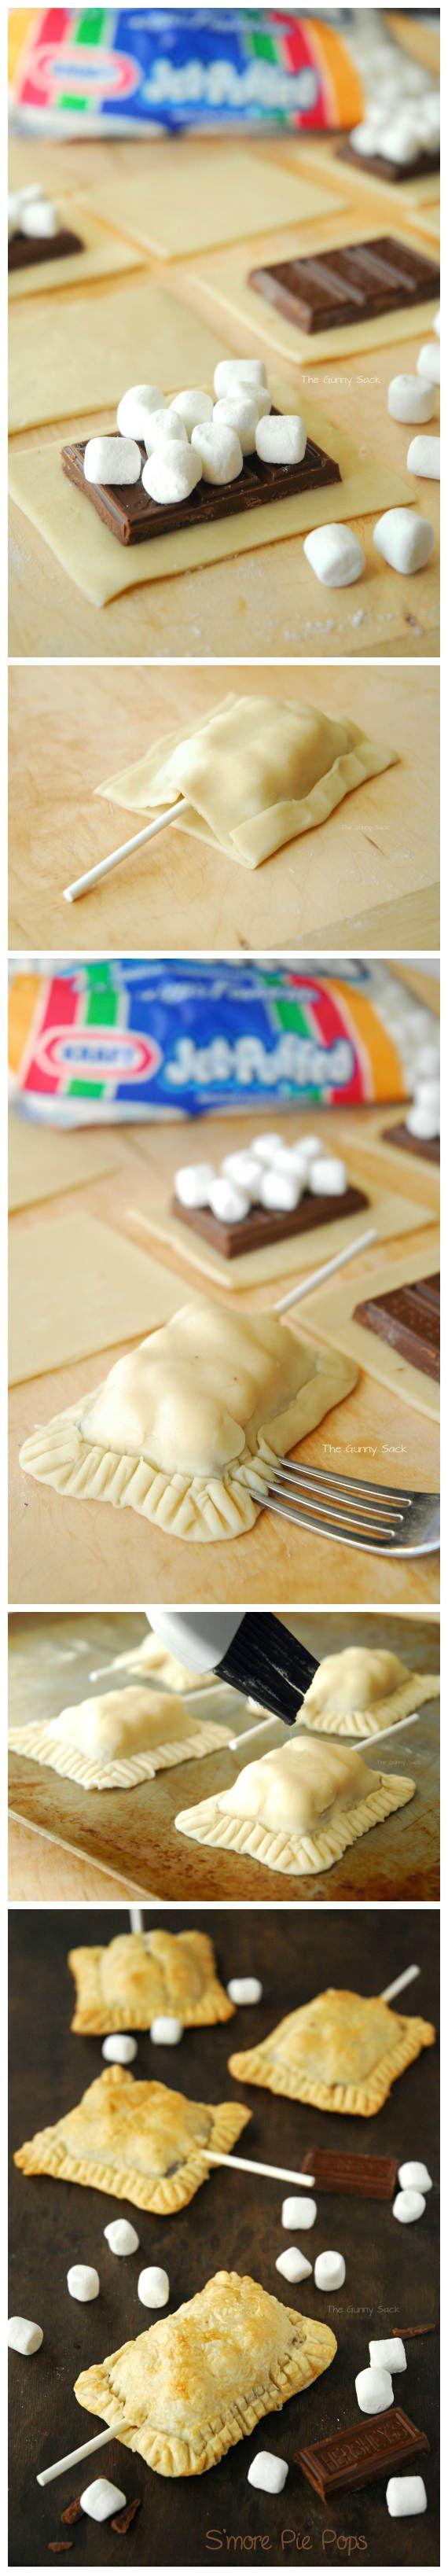 Ingredients:   1 pie crust  4.4 oz Hershey's XL Milk Chocolate Bar  2 cups mini marshmallows  1 egg white - beaten  Pinch of flour   Inst...